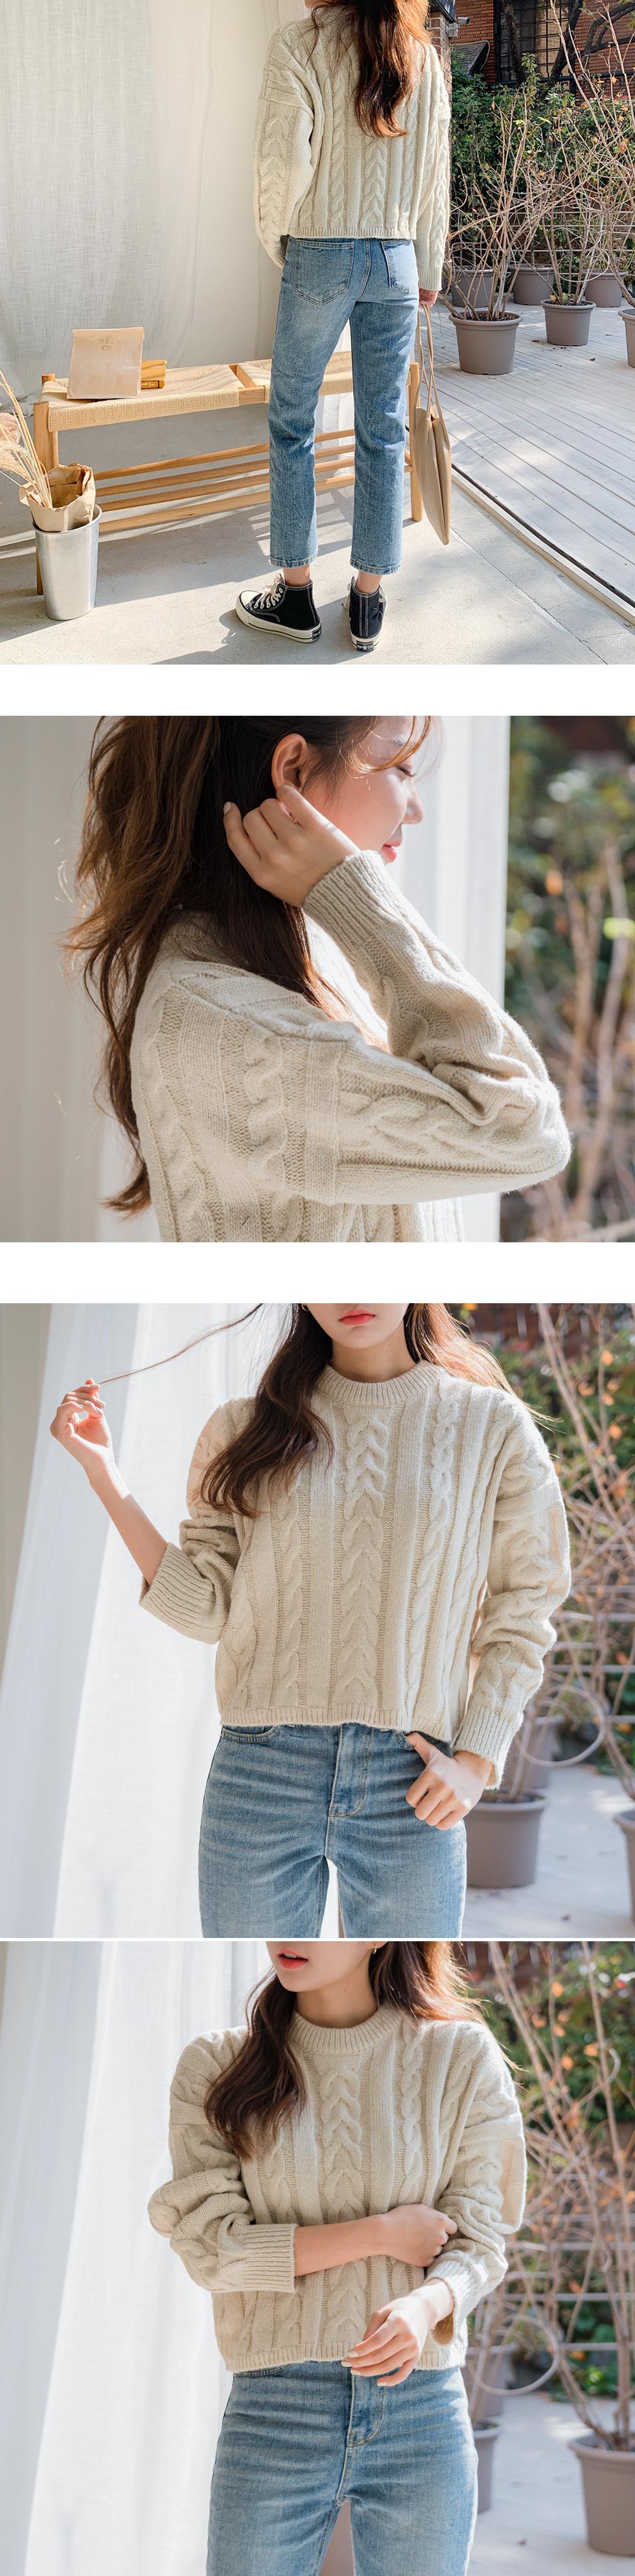 Semi-Exhaust Knit